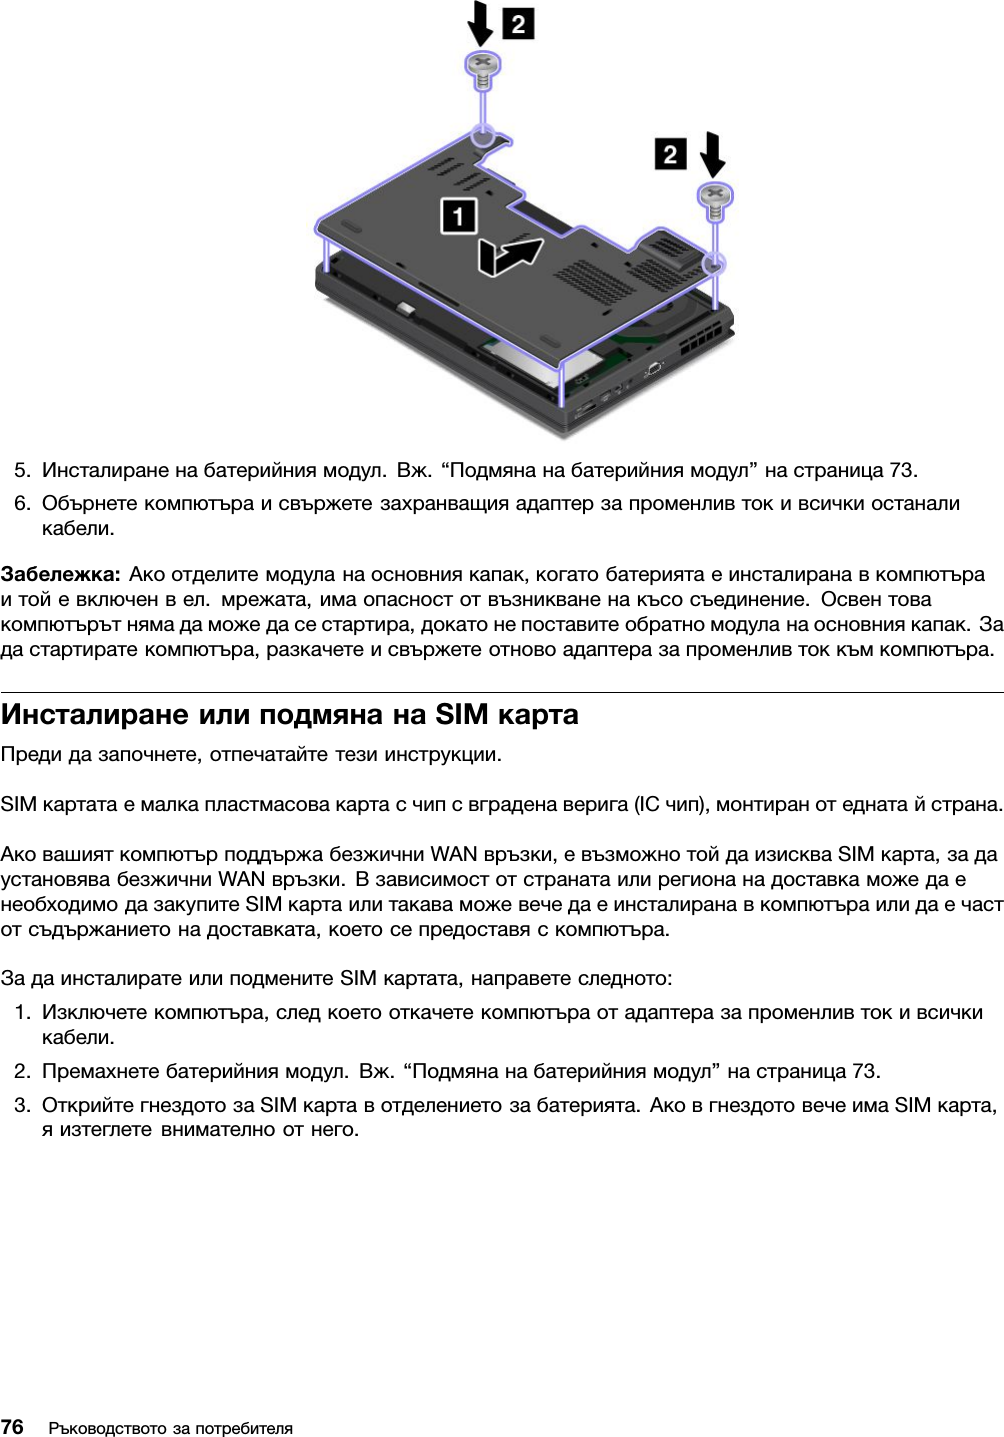 323664eda16 Lenovo T440P Ug Bg User Manual (Bulgarian) Guide Think Pad Laptop (Think  Pad) Type 20AW